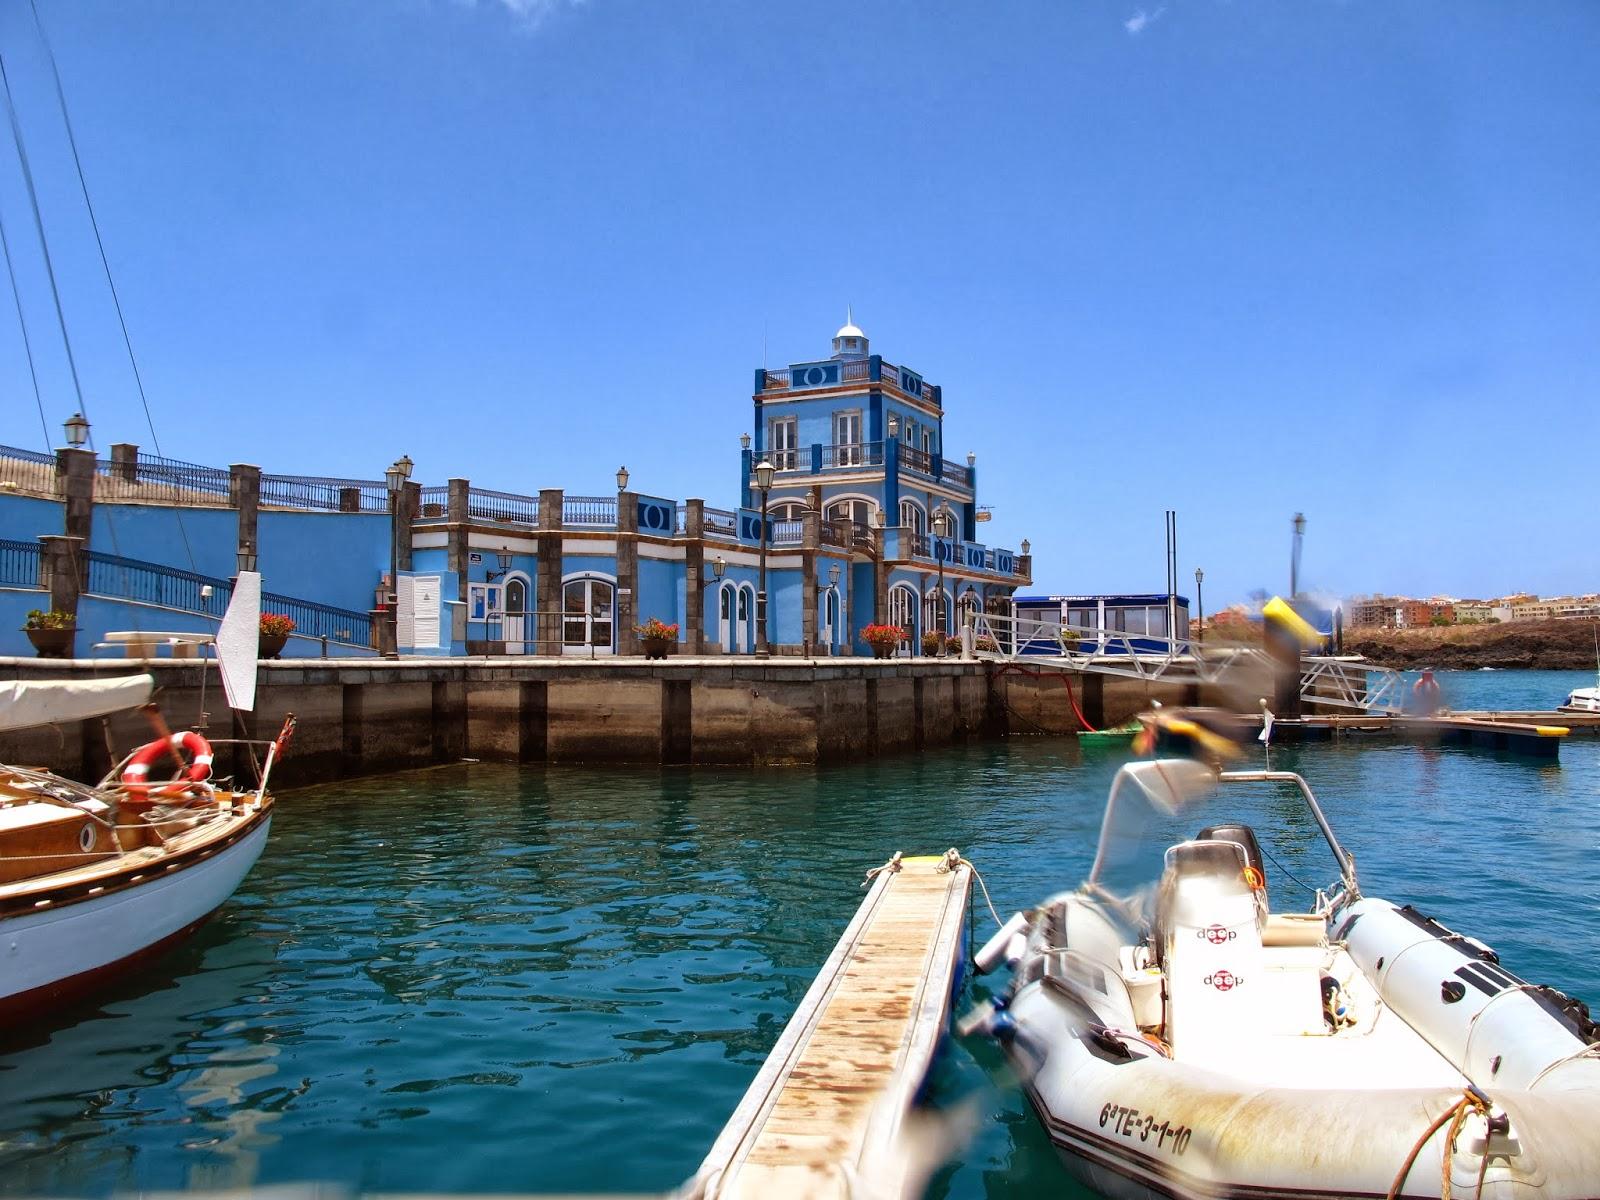 Noleggio Barche Marina San Miguel – Isola di Tenerife - Navalia | Noleggia un Sogno